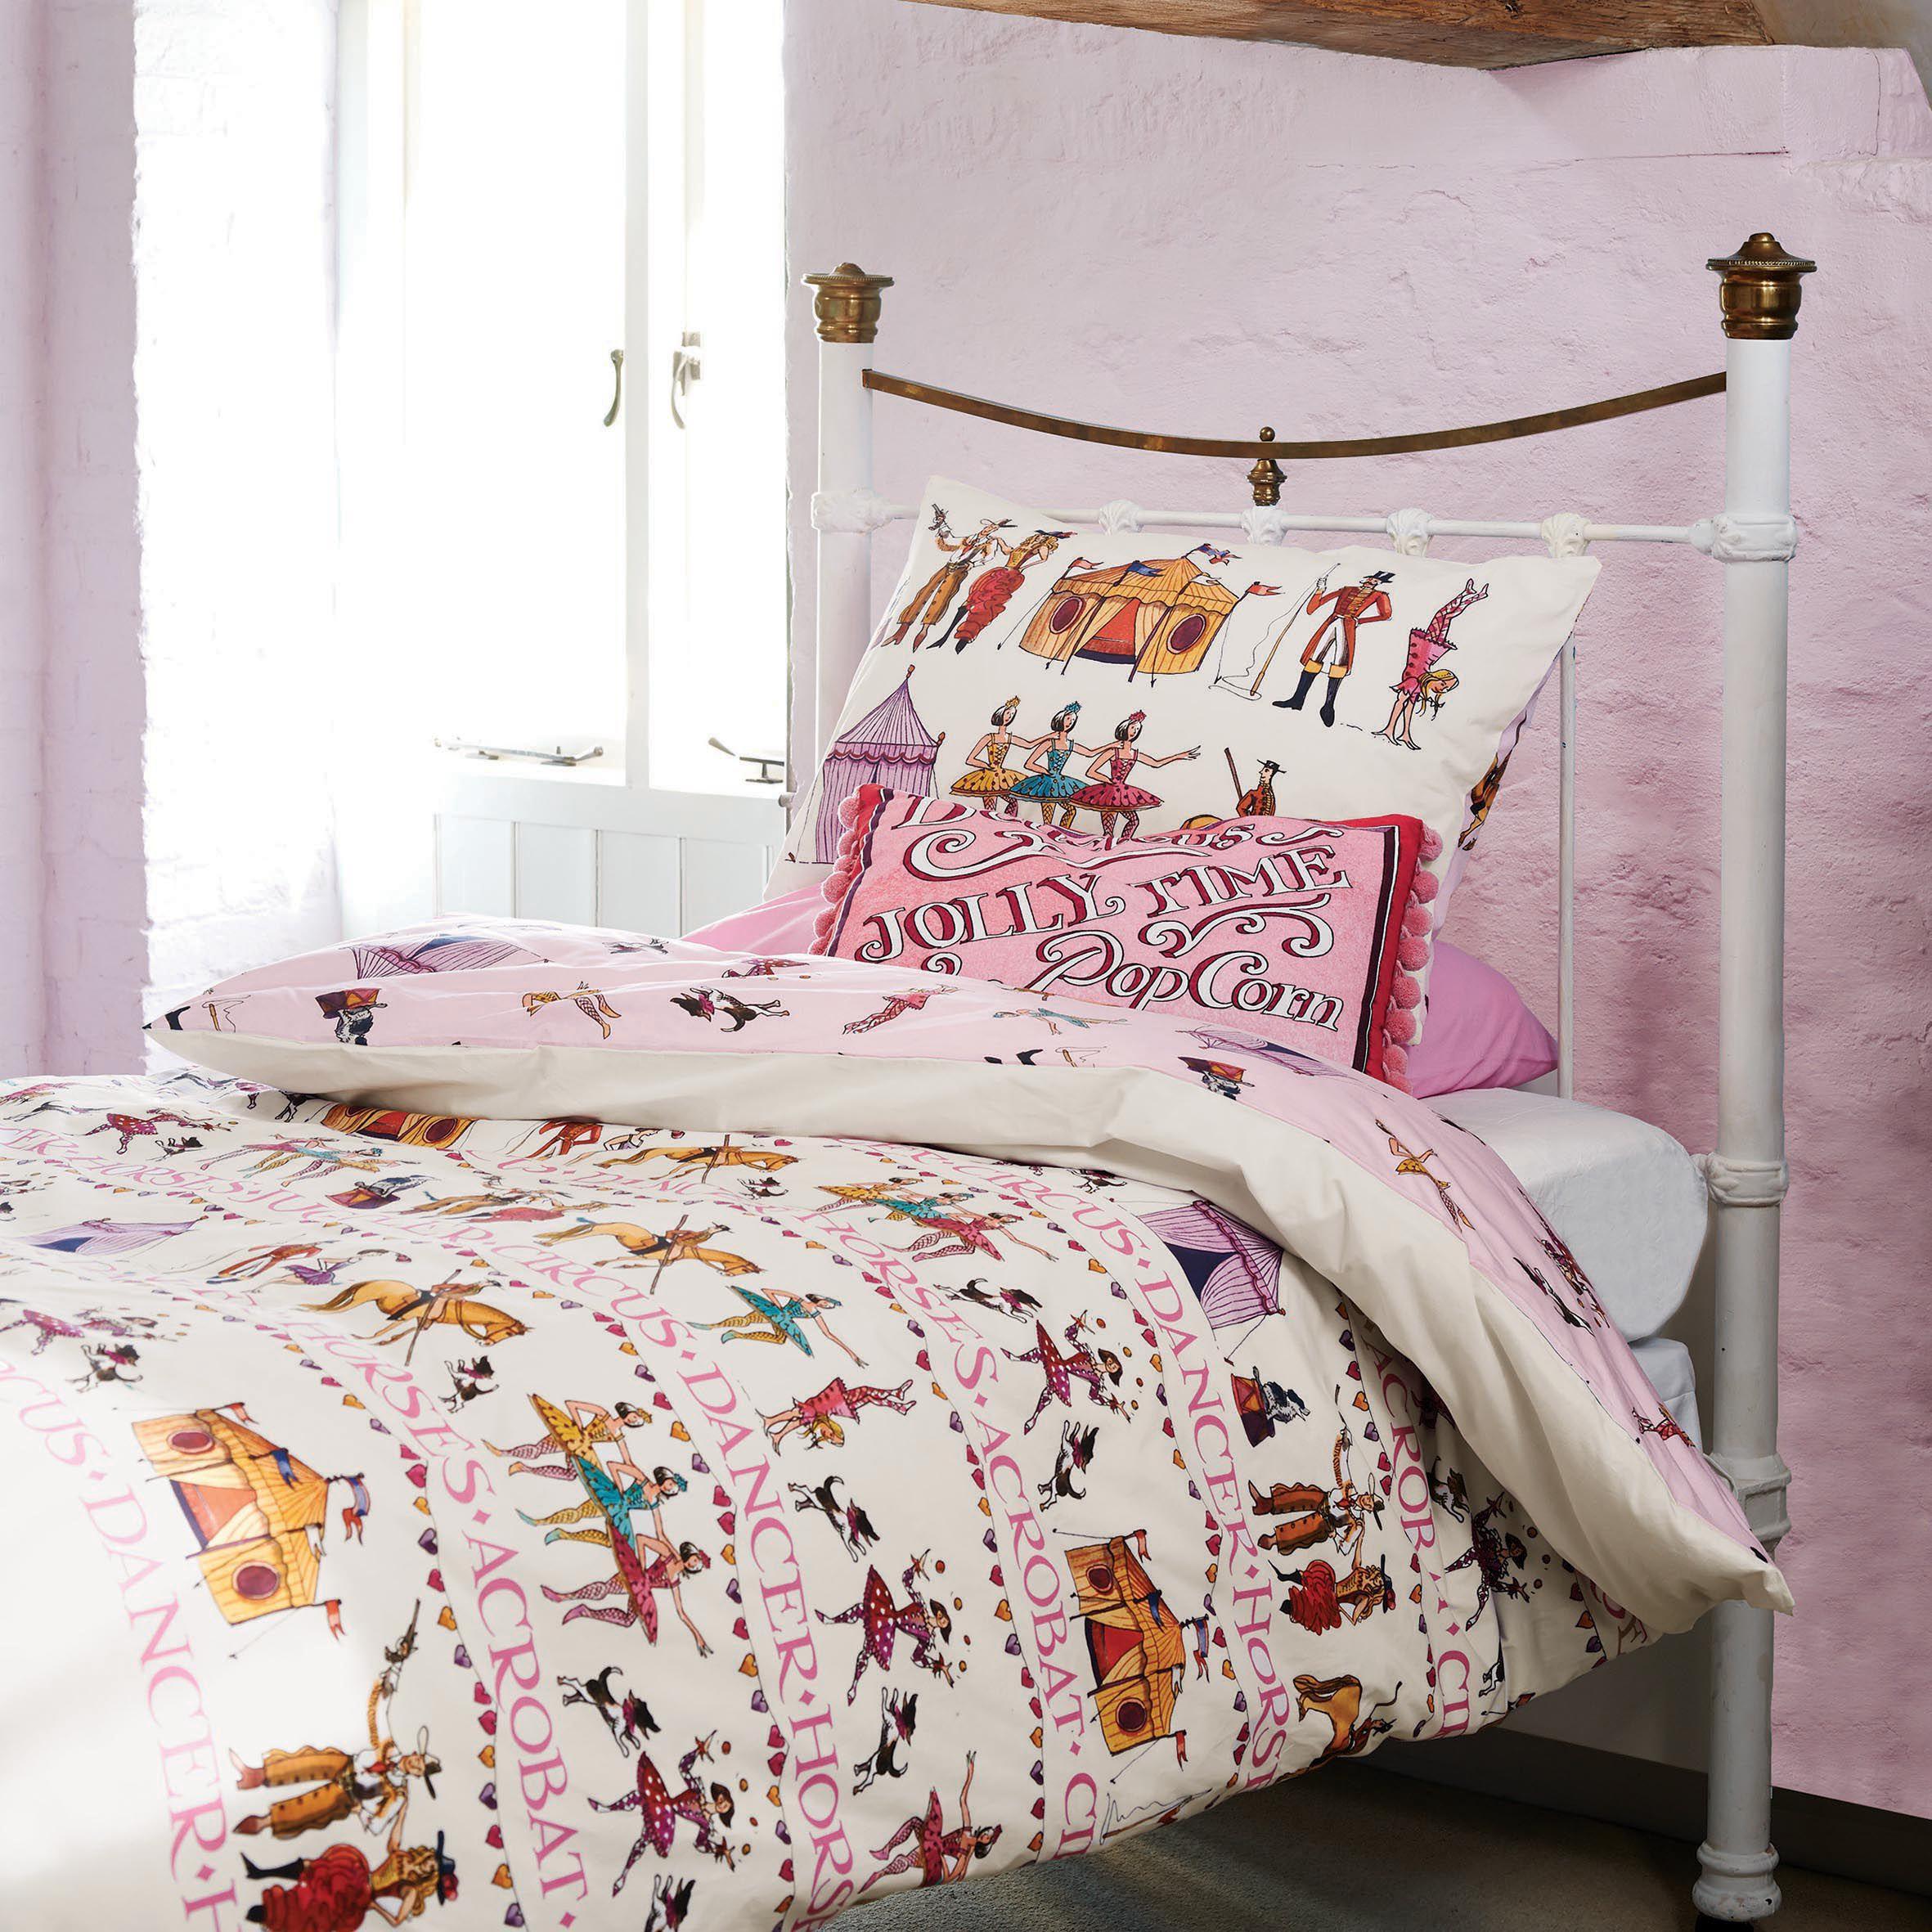 Kitchen Bar Stools Debenhams: Emma Bridgewater Circus Pink & White Single Bed Set